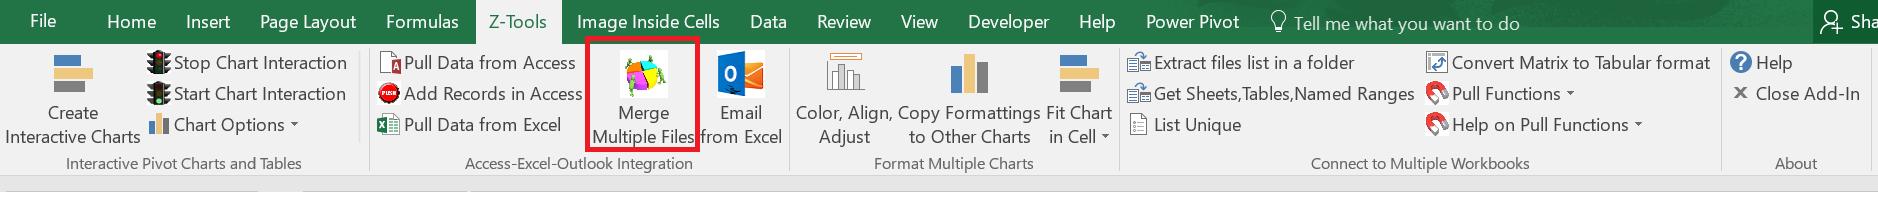 Combine Multiple Workbooks – Power BI & Excel are better